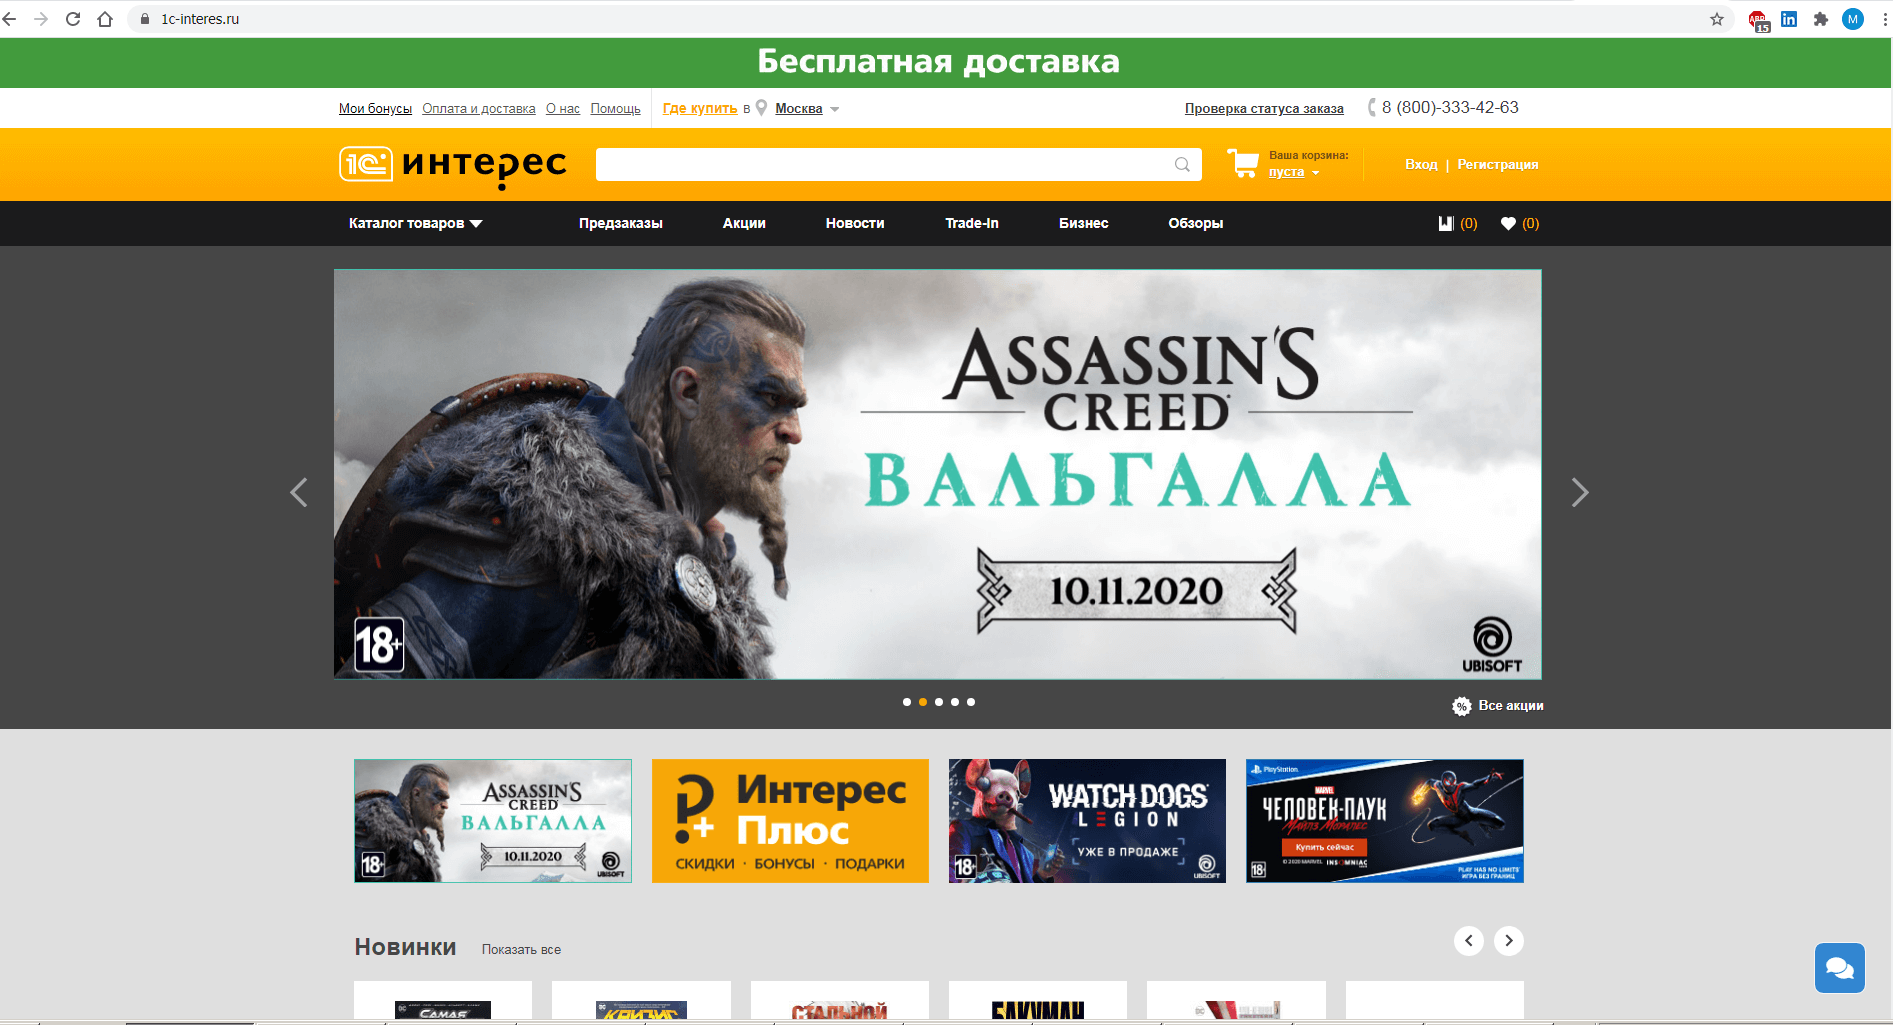 1c-interes.ru website